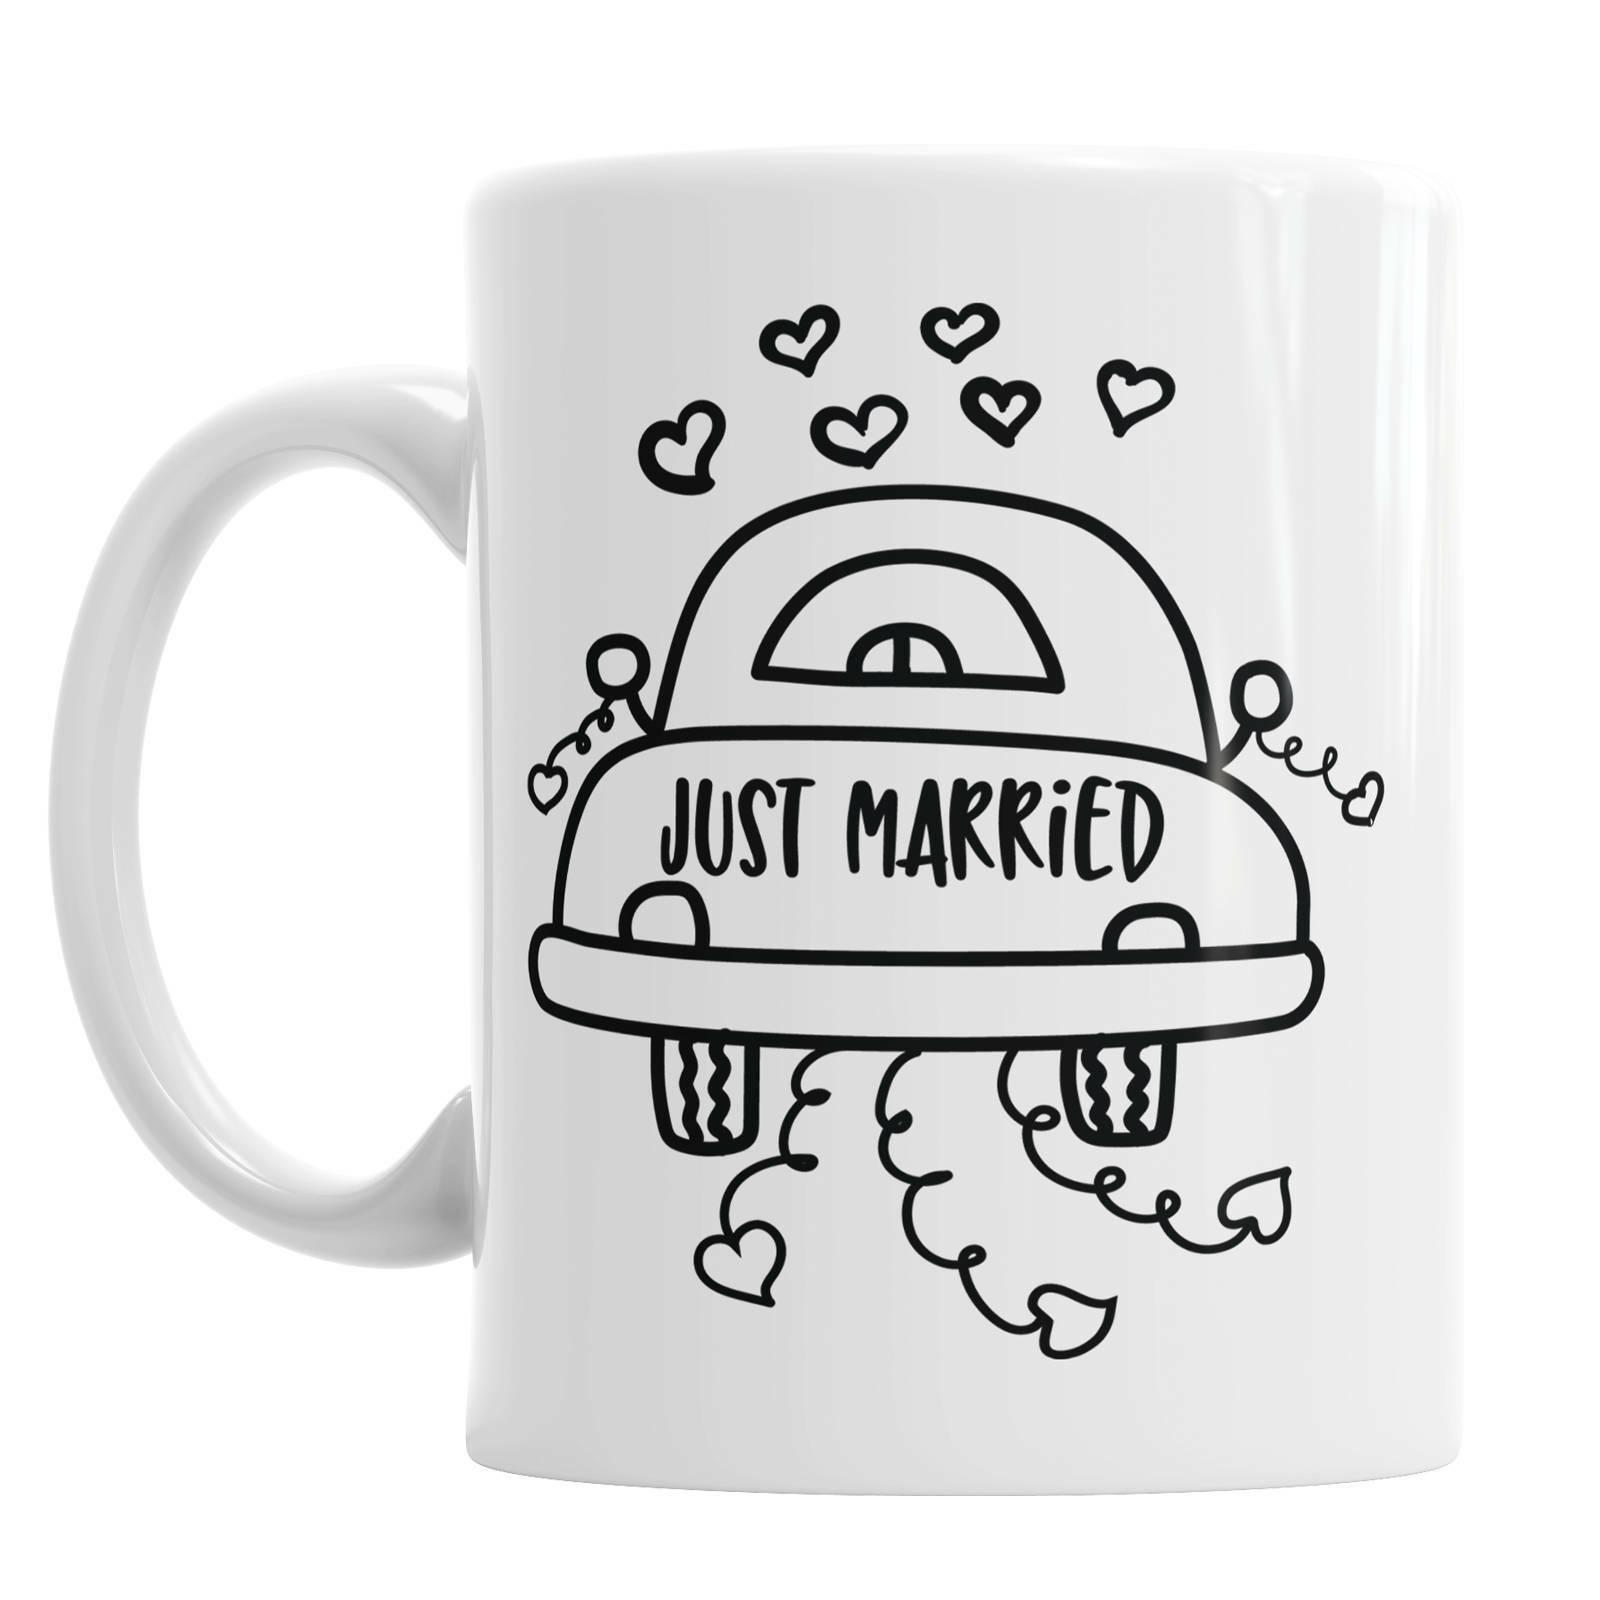 Just Married Mug Just Married Gift Wedding Car Mug Married Mug Married Gift - $13.99